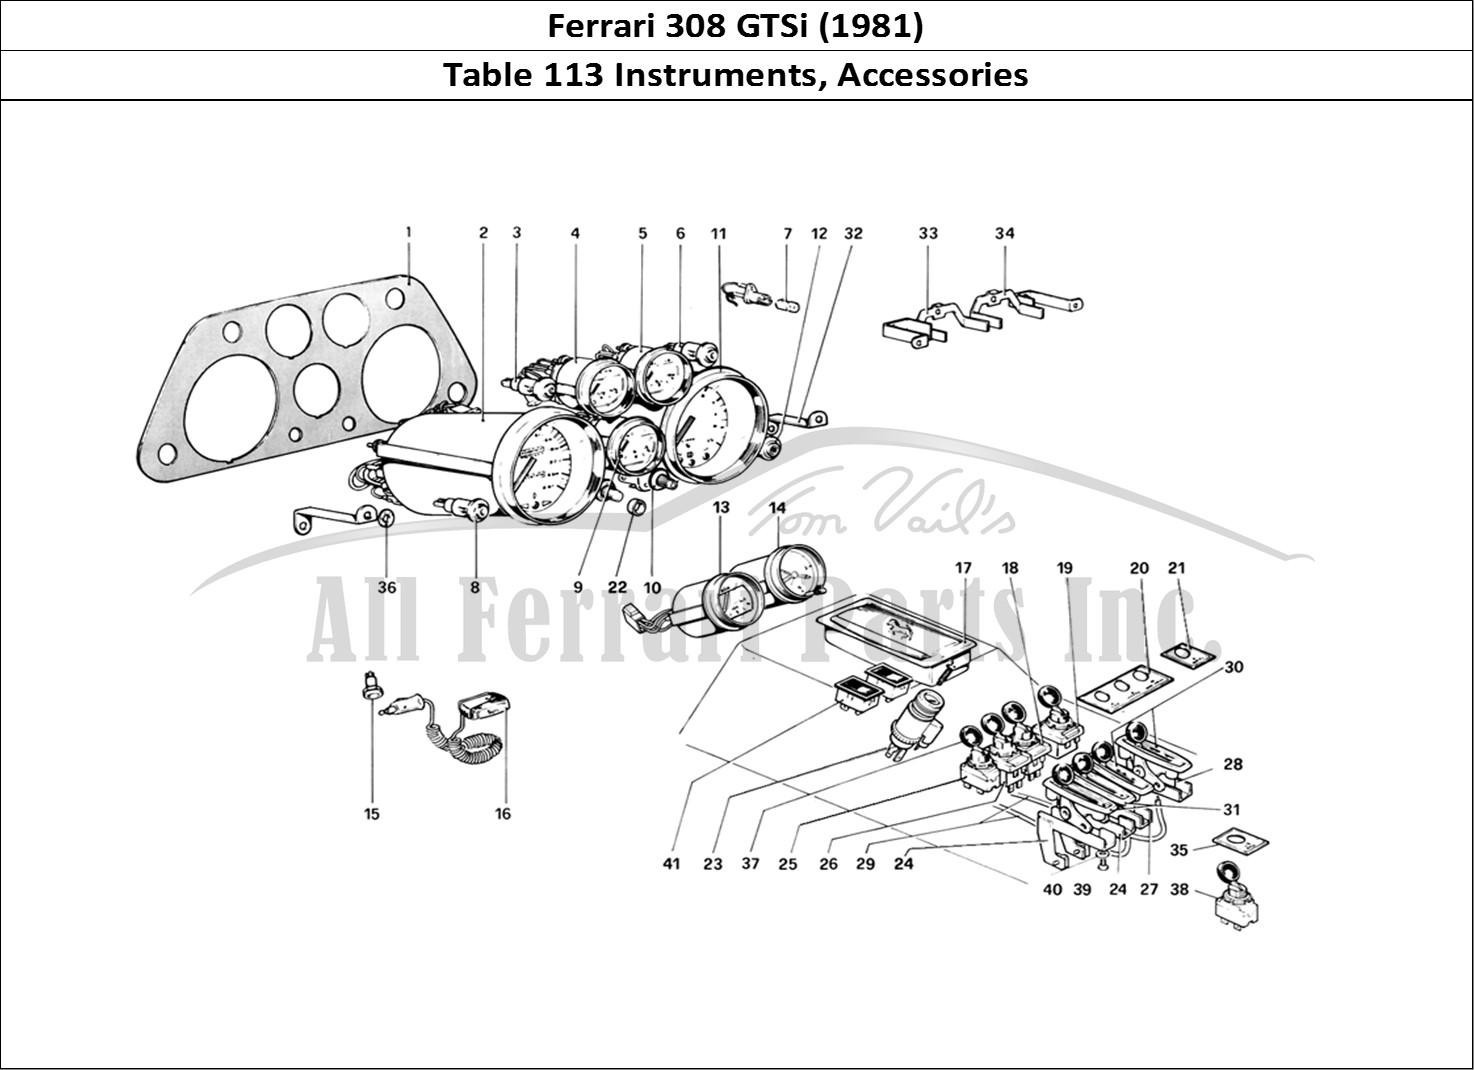 buy original ferrari 308 gtsi  1981  113 instruments